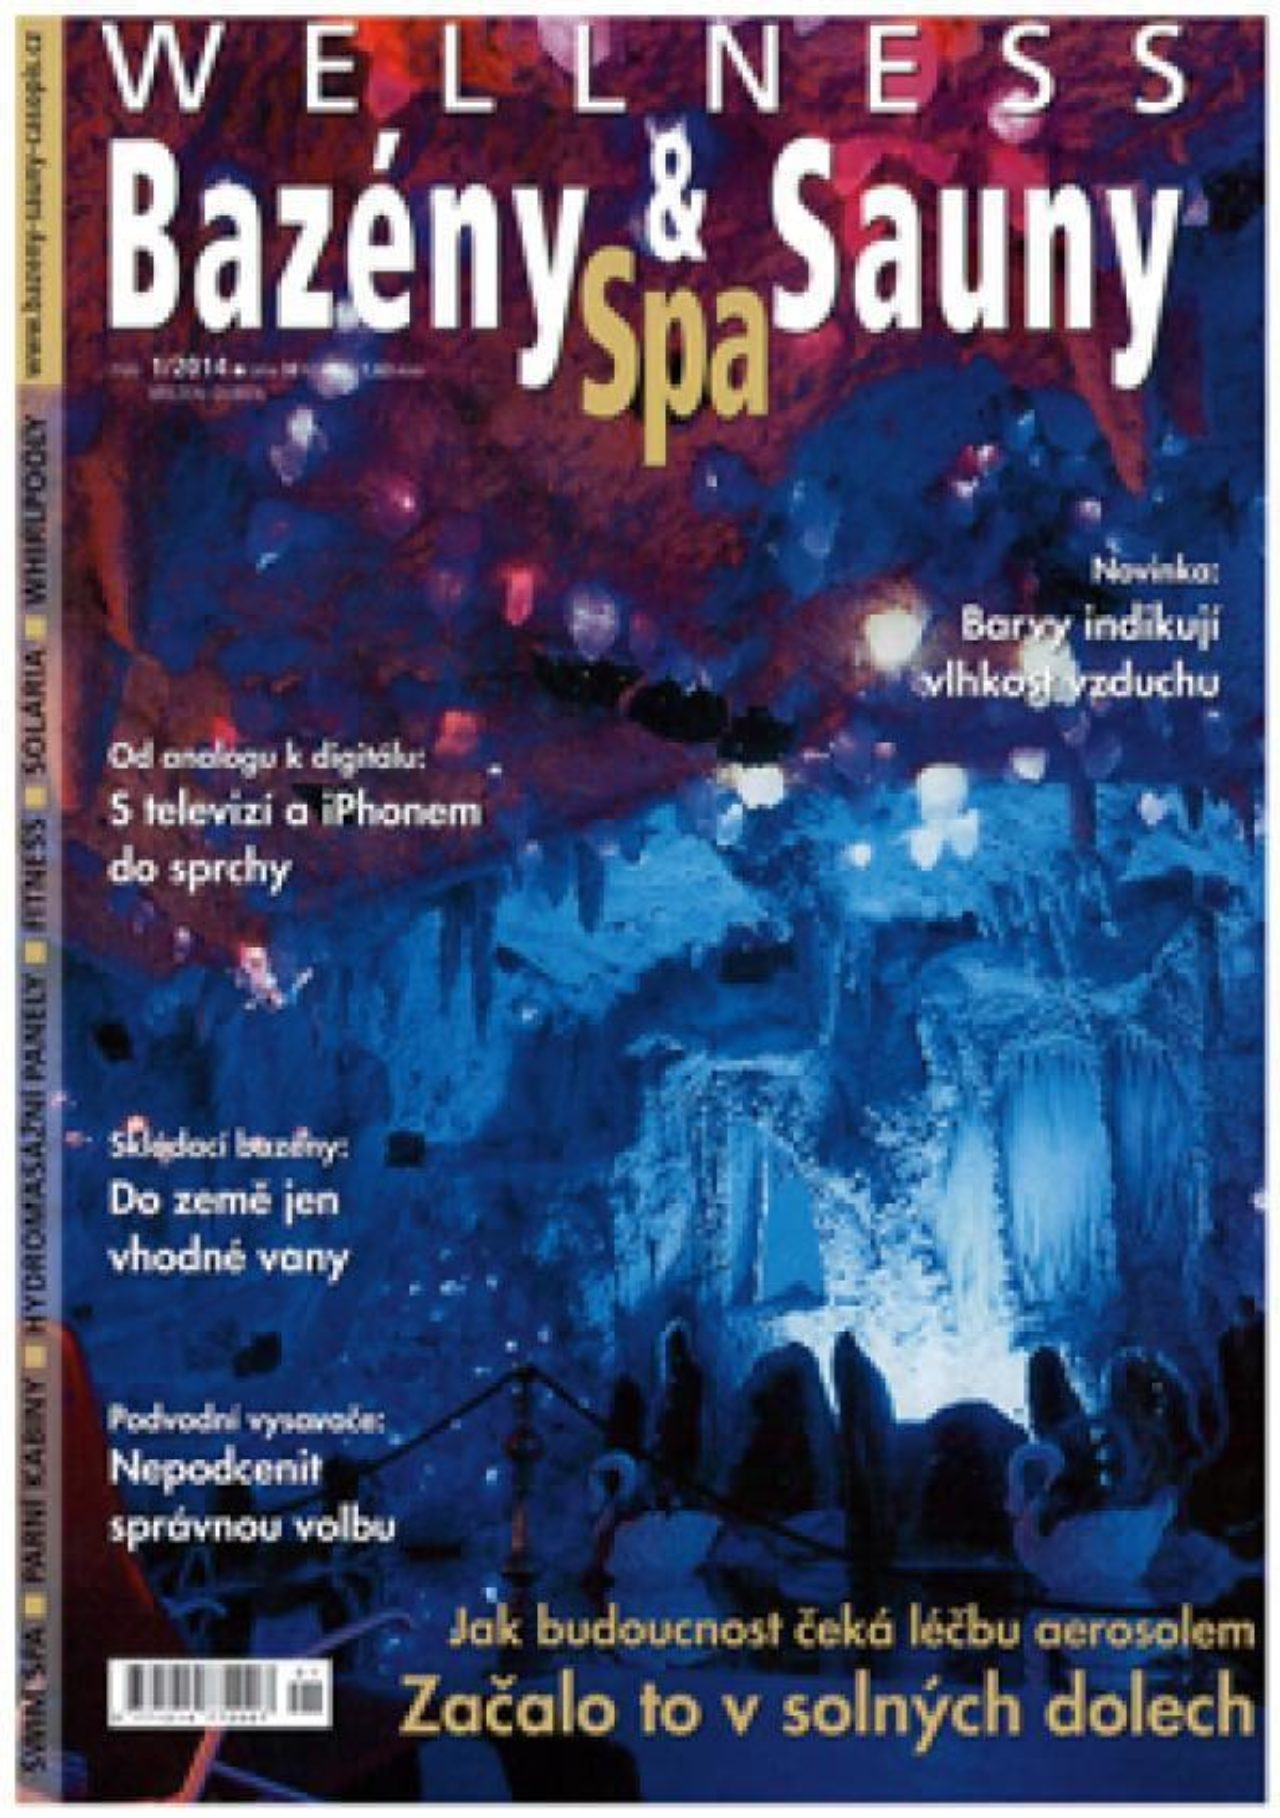 Bazény, Spa&Sauny 1/2014 | Blog - Microwell